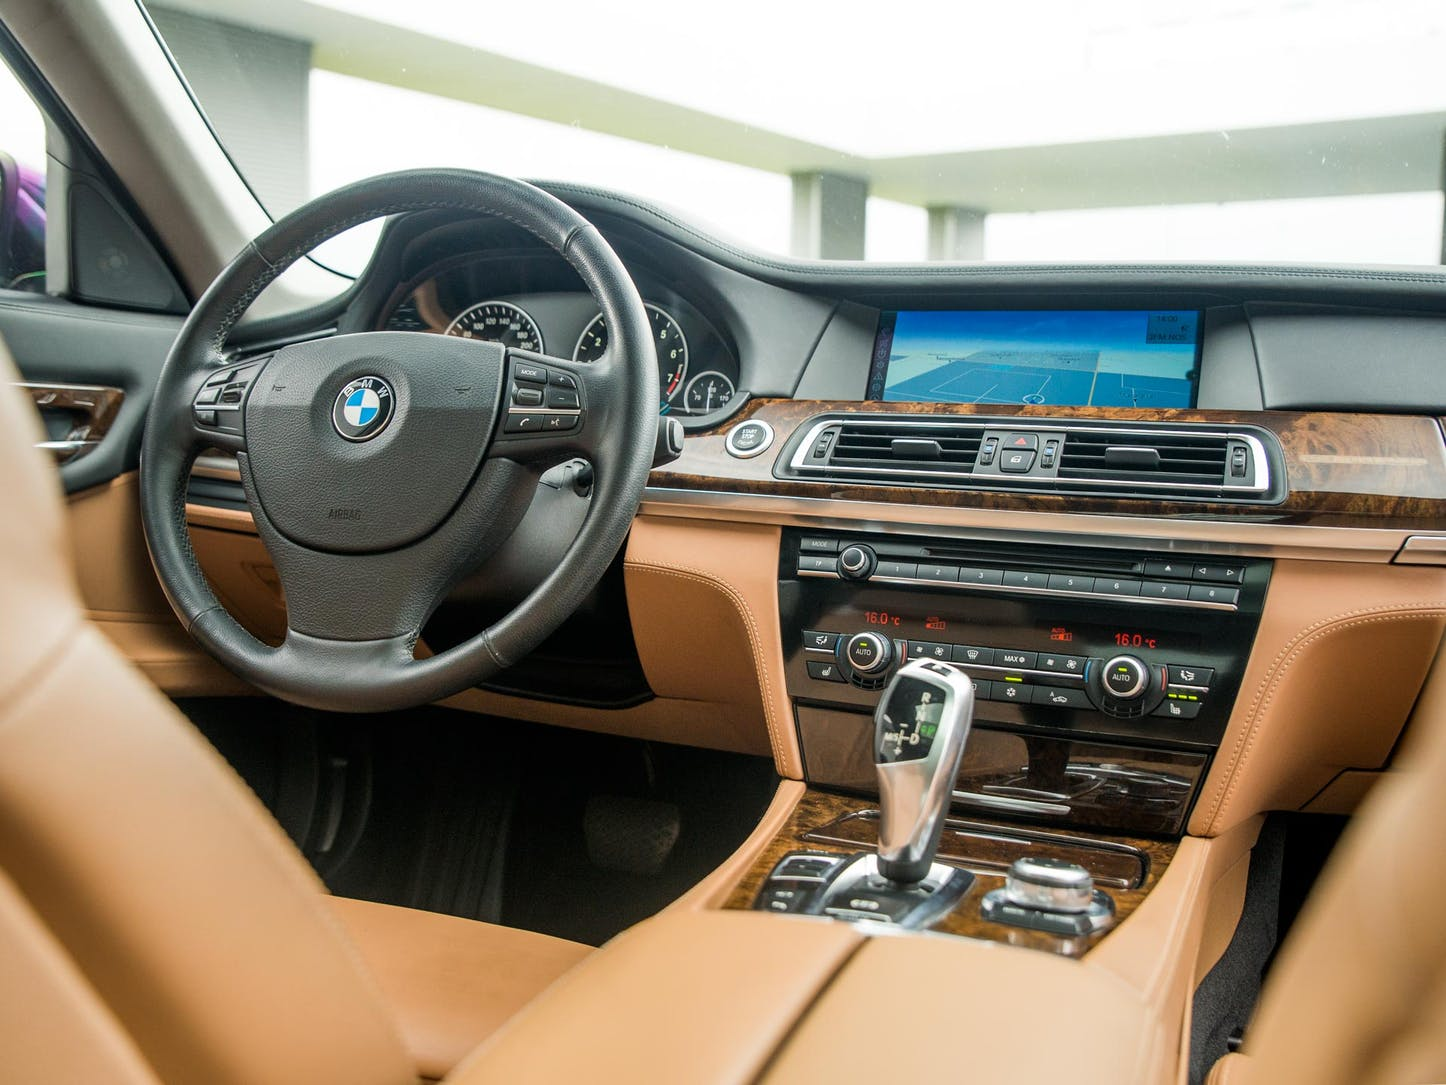 Tweedehands BMW 7 Serie 760i 2009 occasion